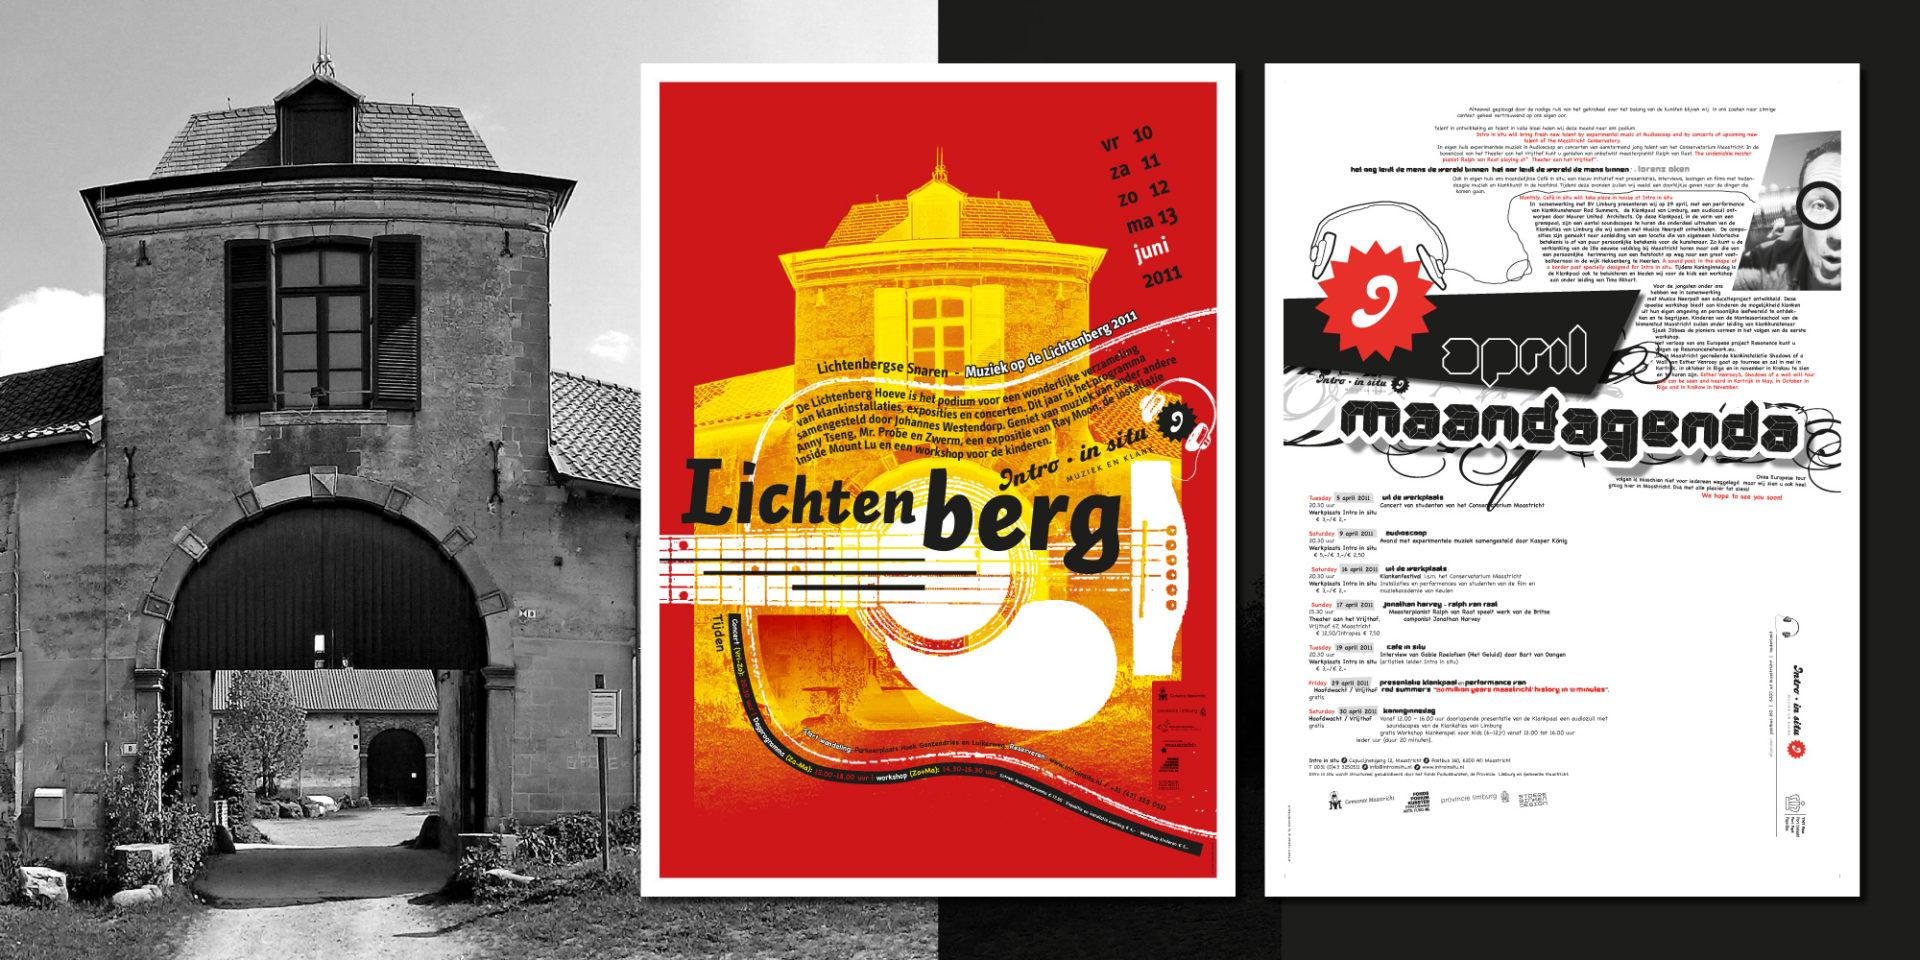 Lichtenberg - Jeroen Borrenbergs)